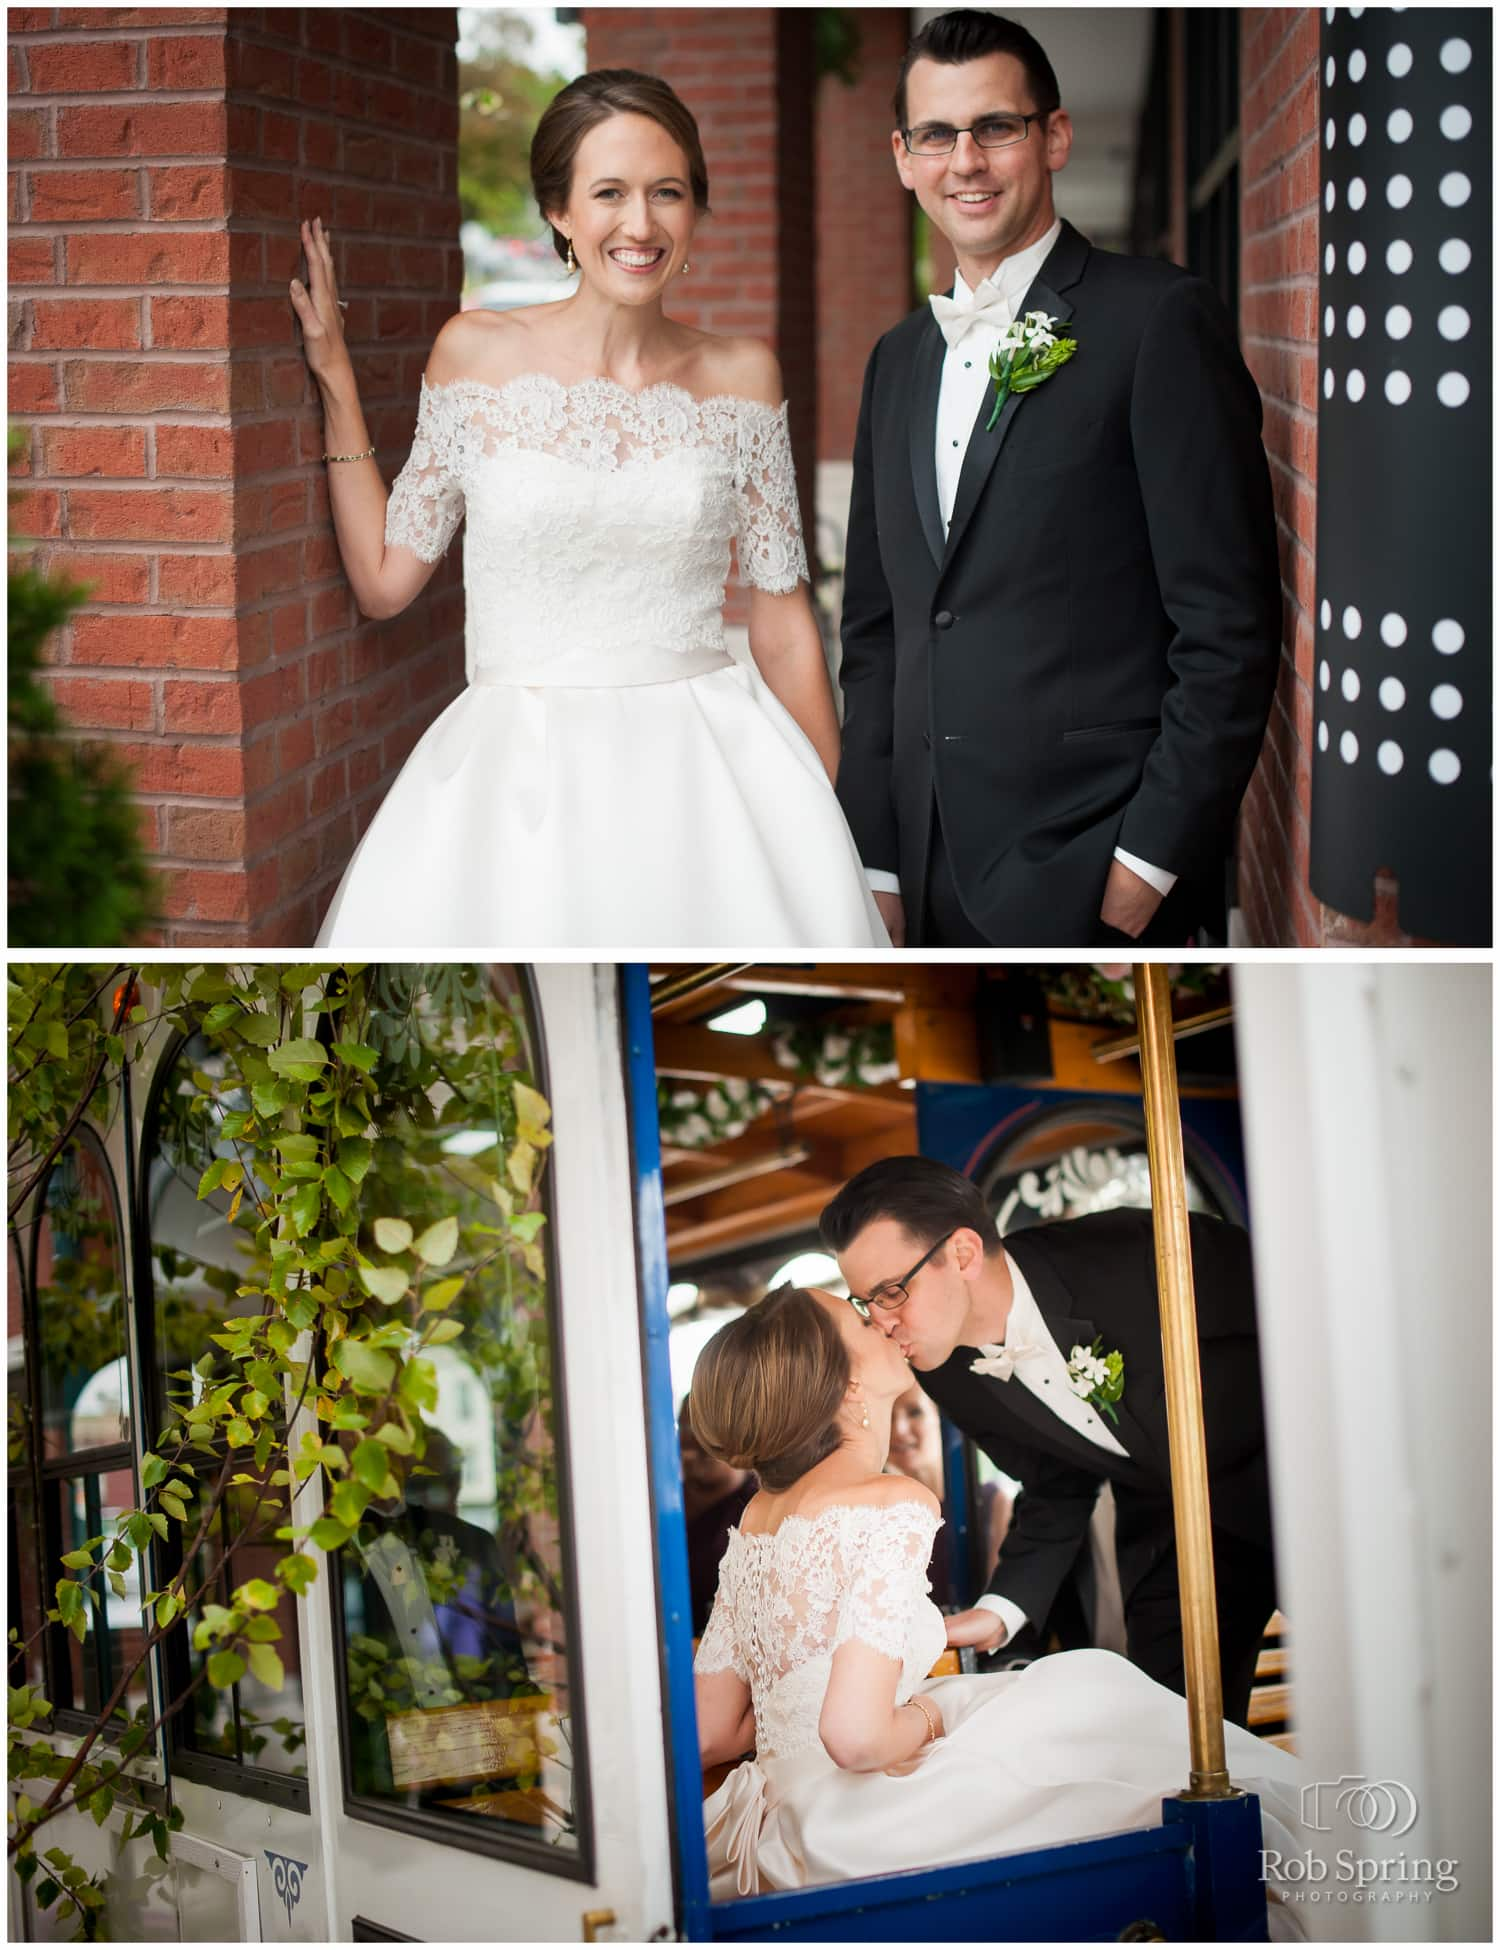 Wedding photos, Pavilion Grand Hotel, Saratoga Springs, NY wedding photographer | Canfield Casino wedding